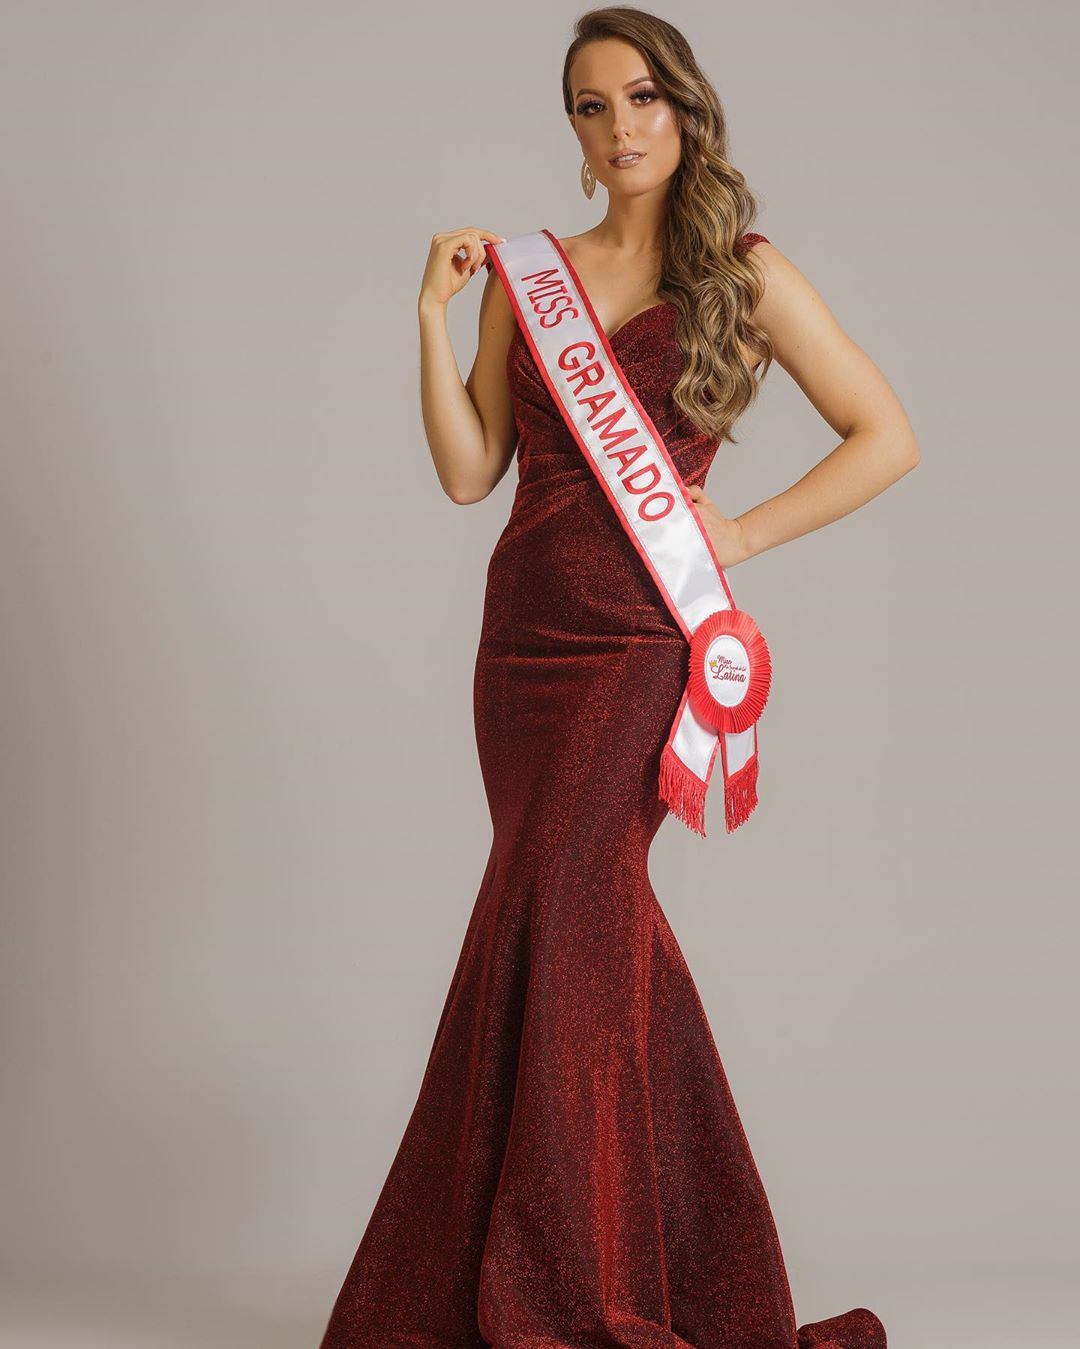 cristine boff sartor, segunda finalista de miss latinoamerica 2019. - Página 5 65387810